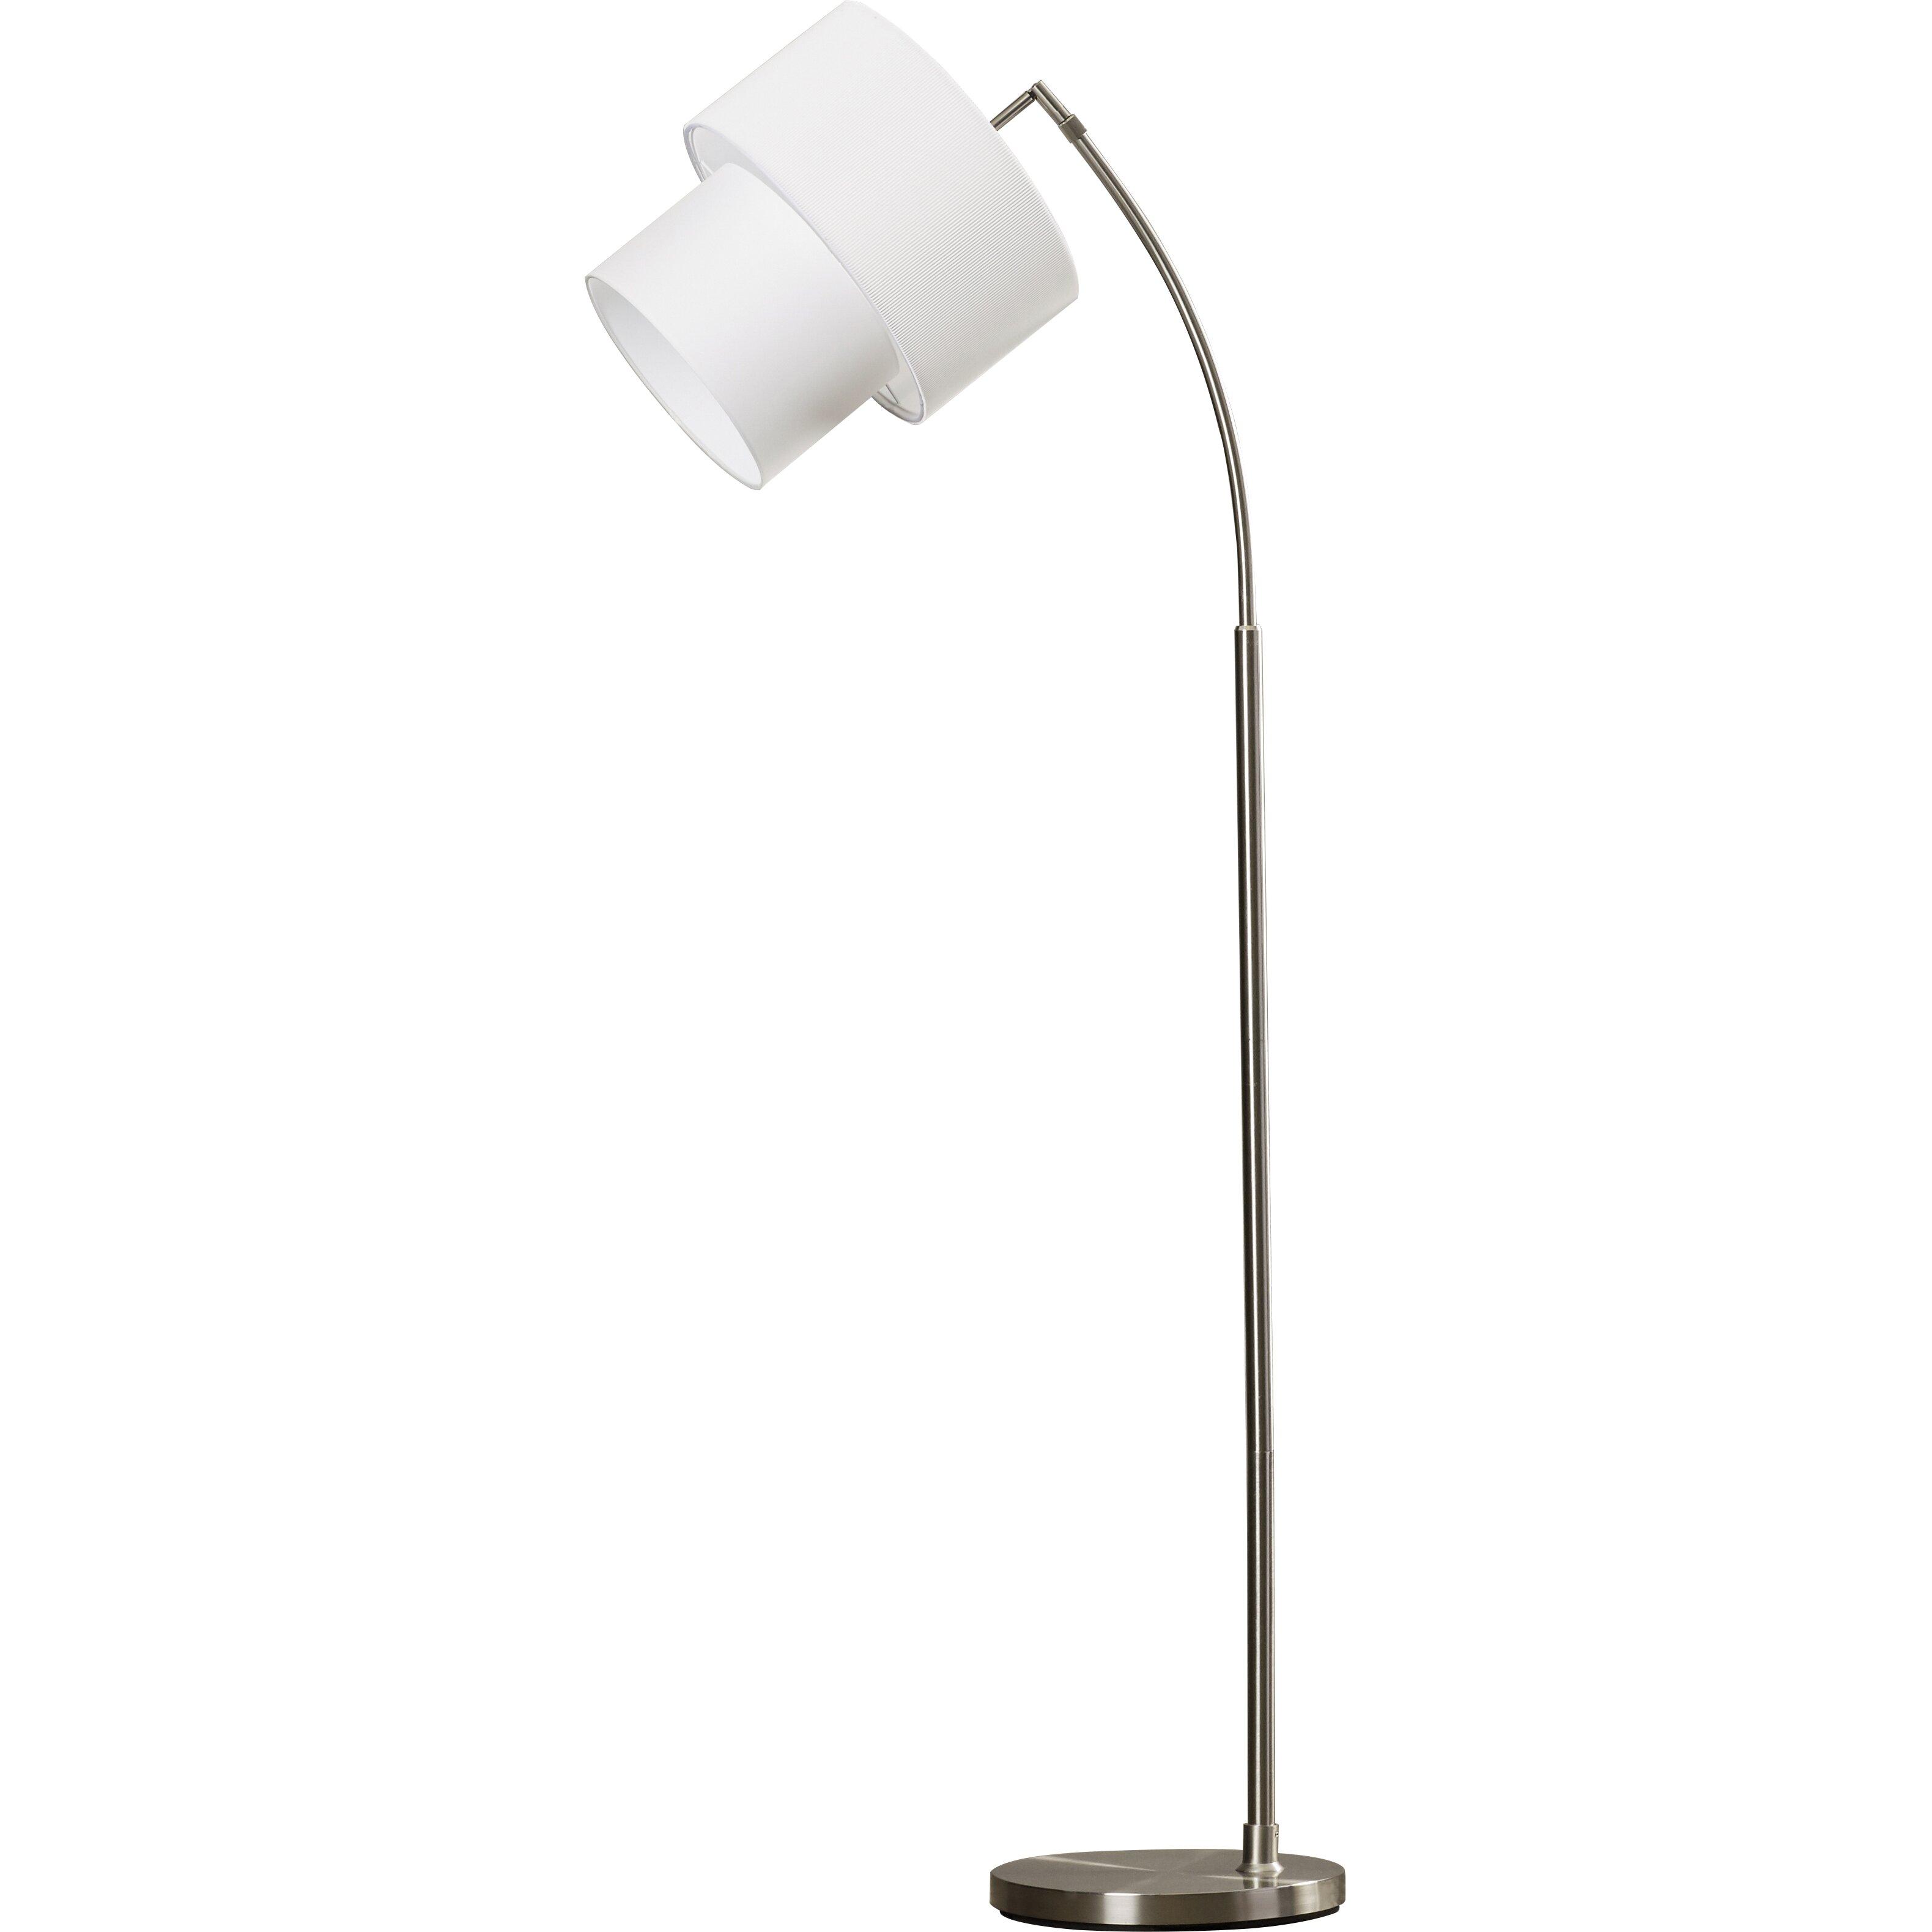 langley street duneany 71 arched floor lamp reviews wayfair. Black Bedroom Furniture Sets. Home Design Ideas